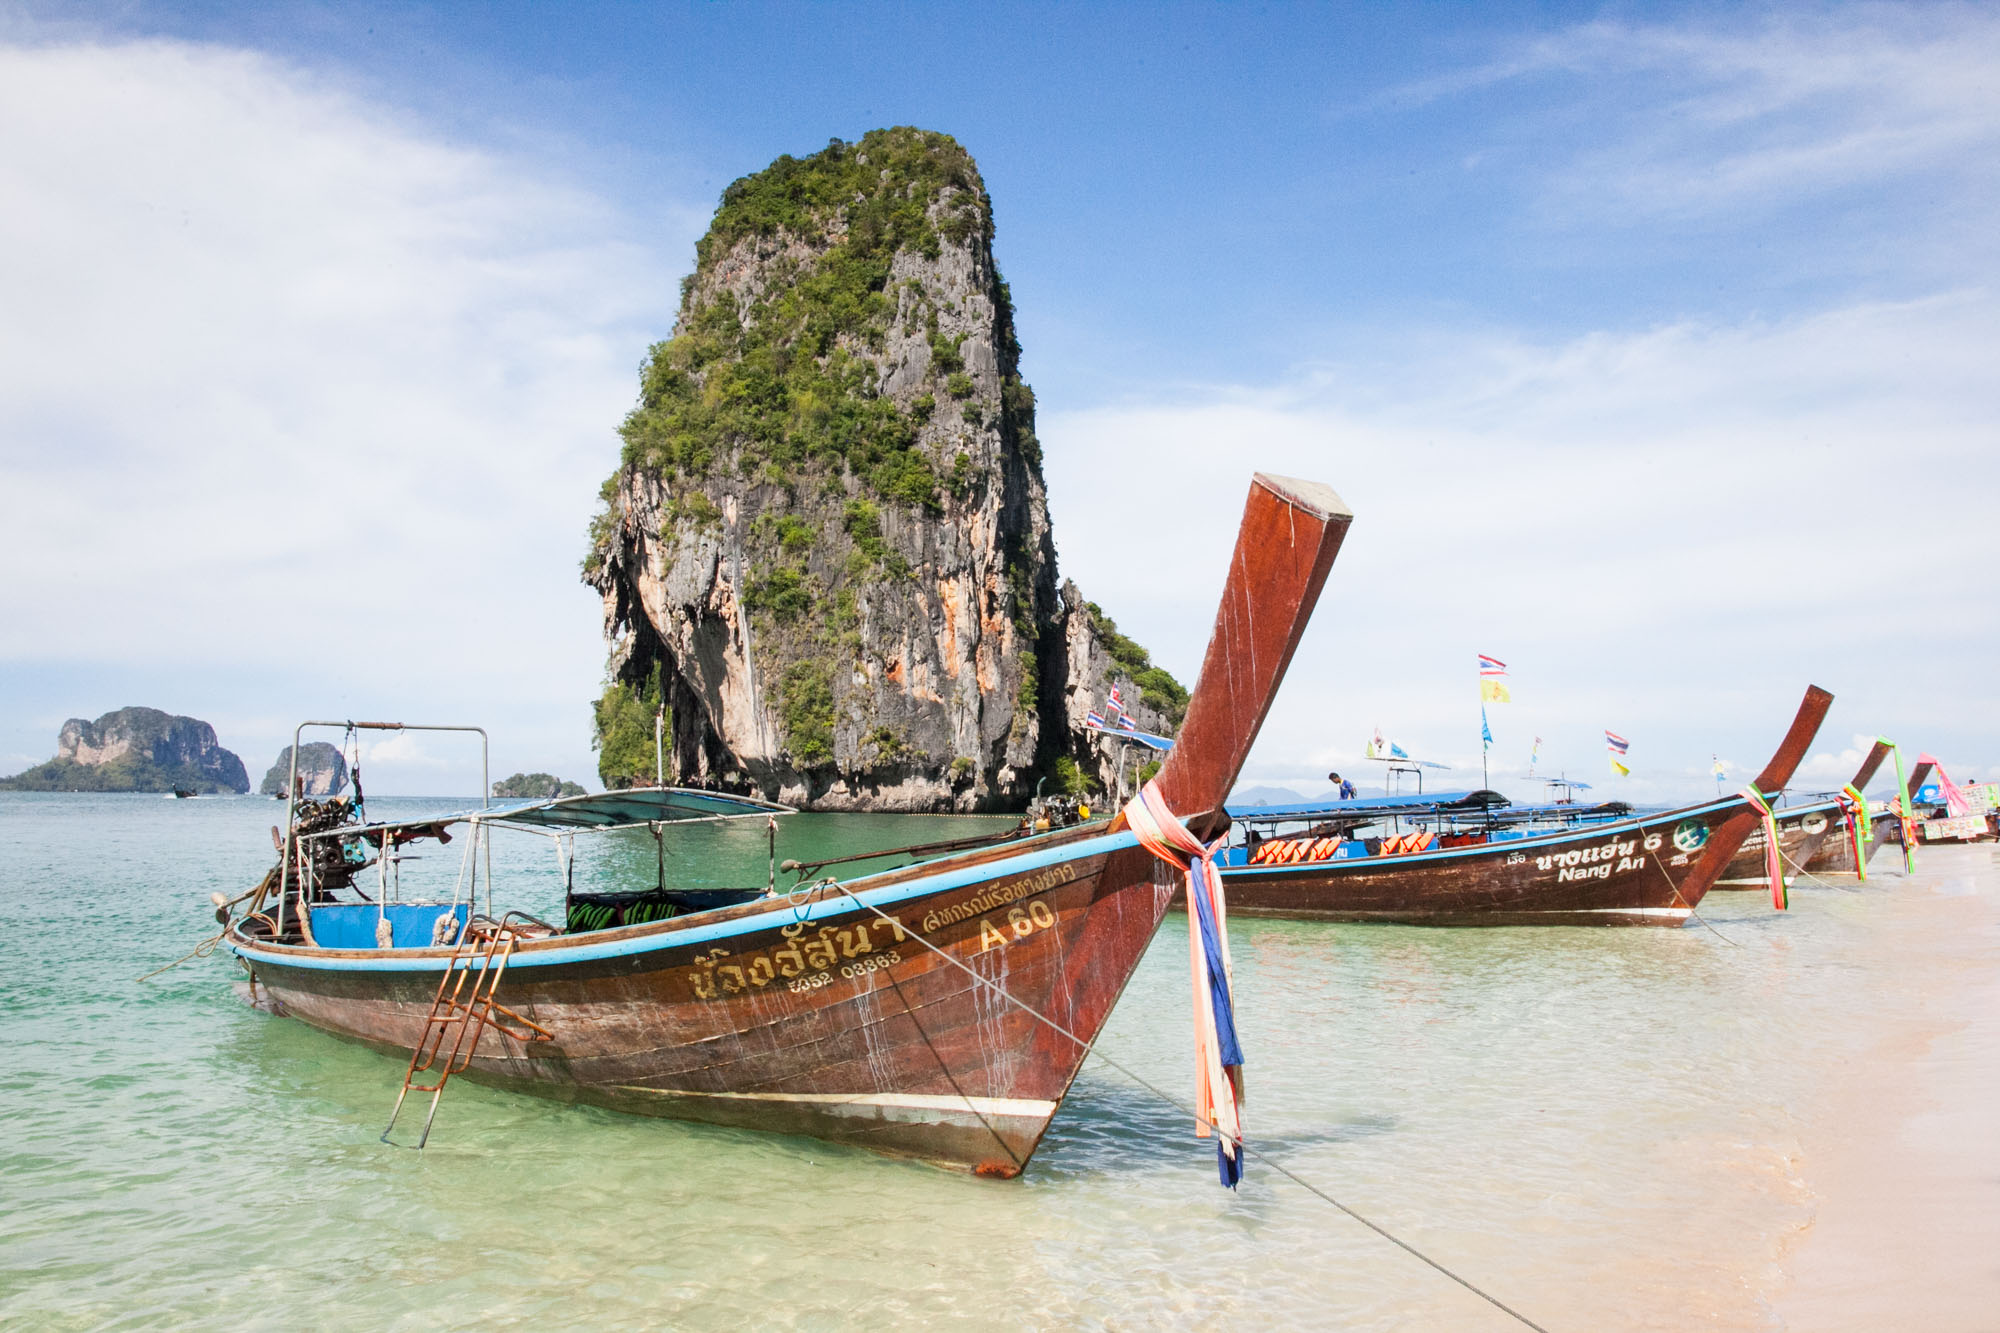 IMG_3811-railay-beach-thailand-phranang-beach-trisa-taro.jpg